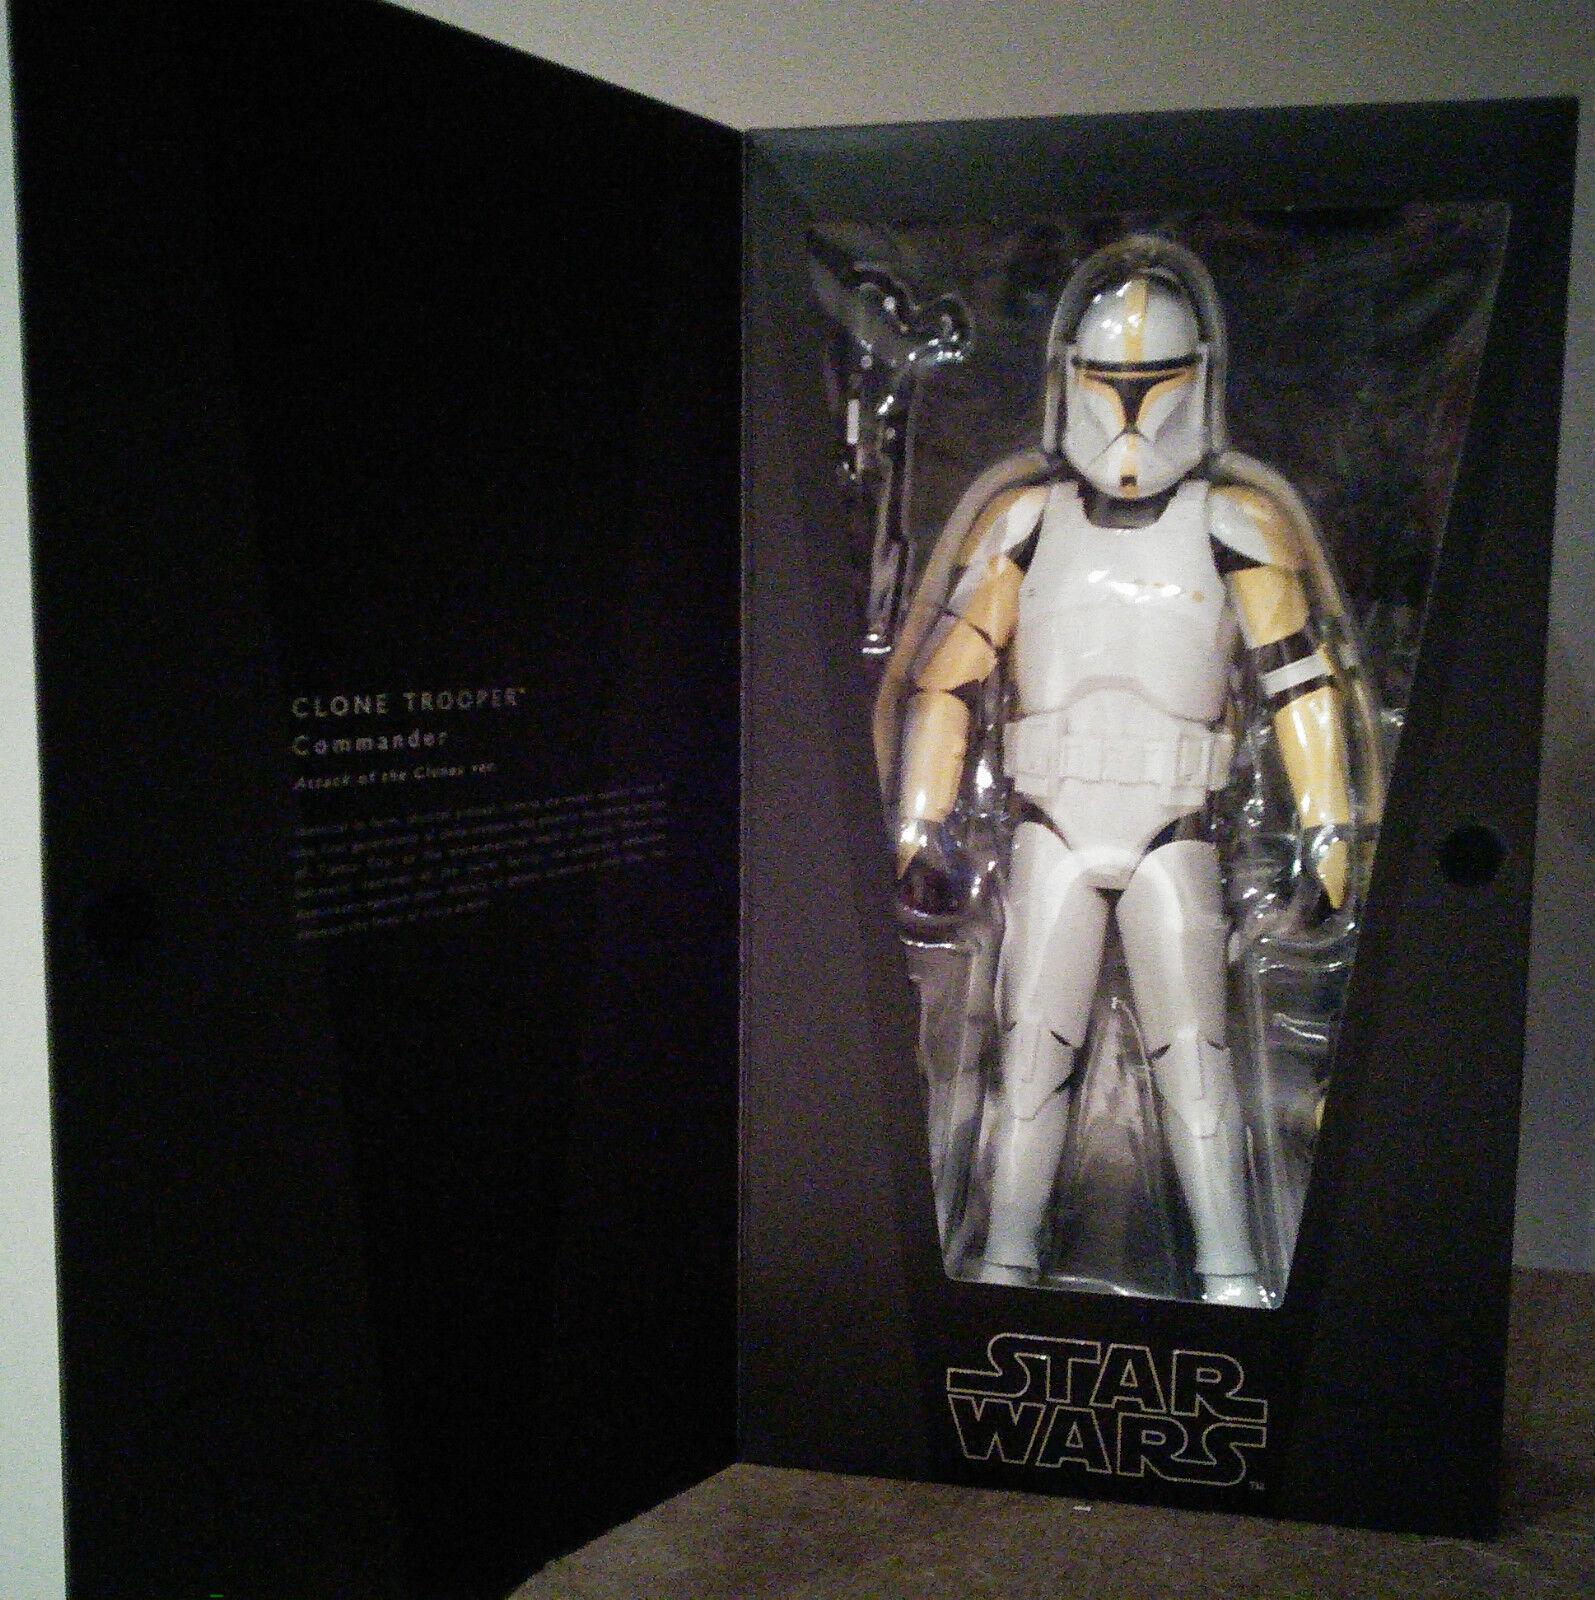 RAH Medicom Star Wars 1 6 Clone Trooper Commander (AOTC version)  (MIB)